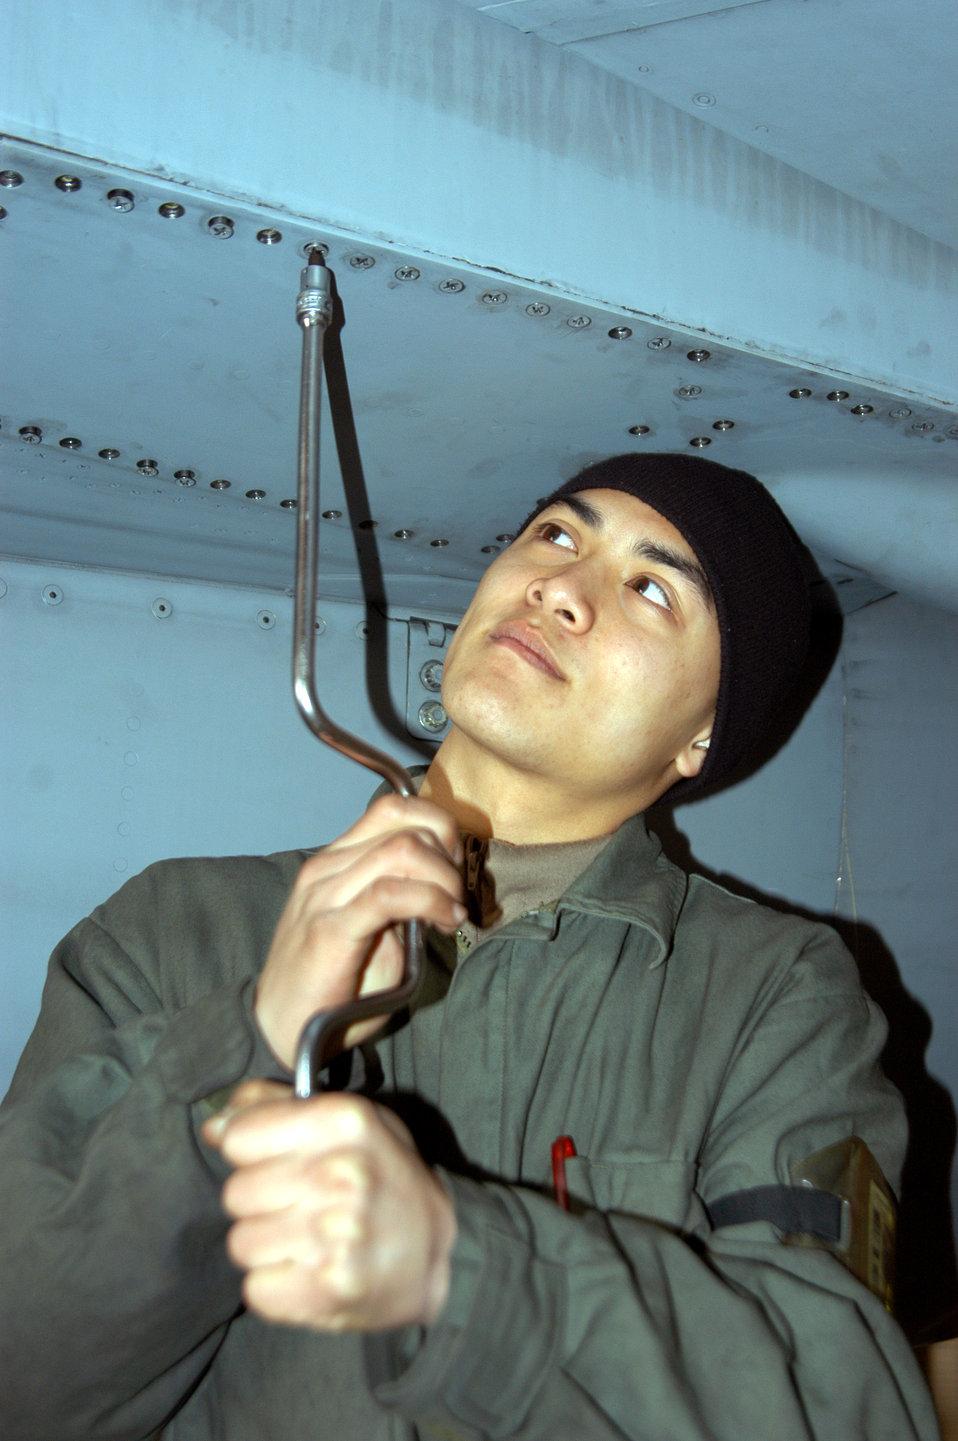 Operation Commando Sling